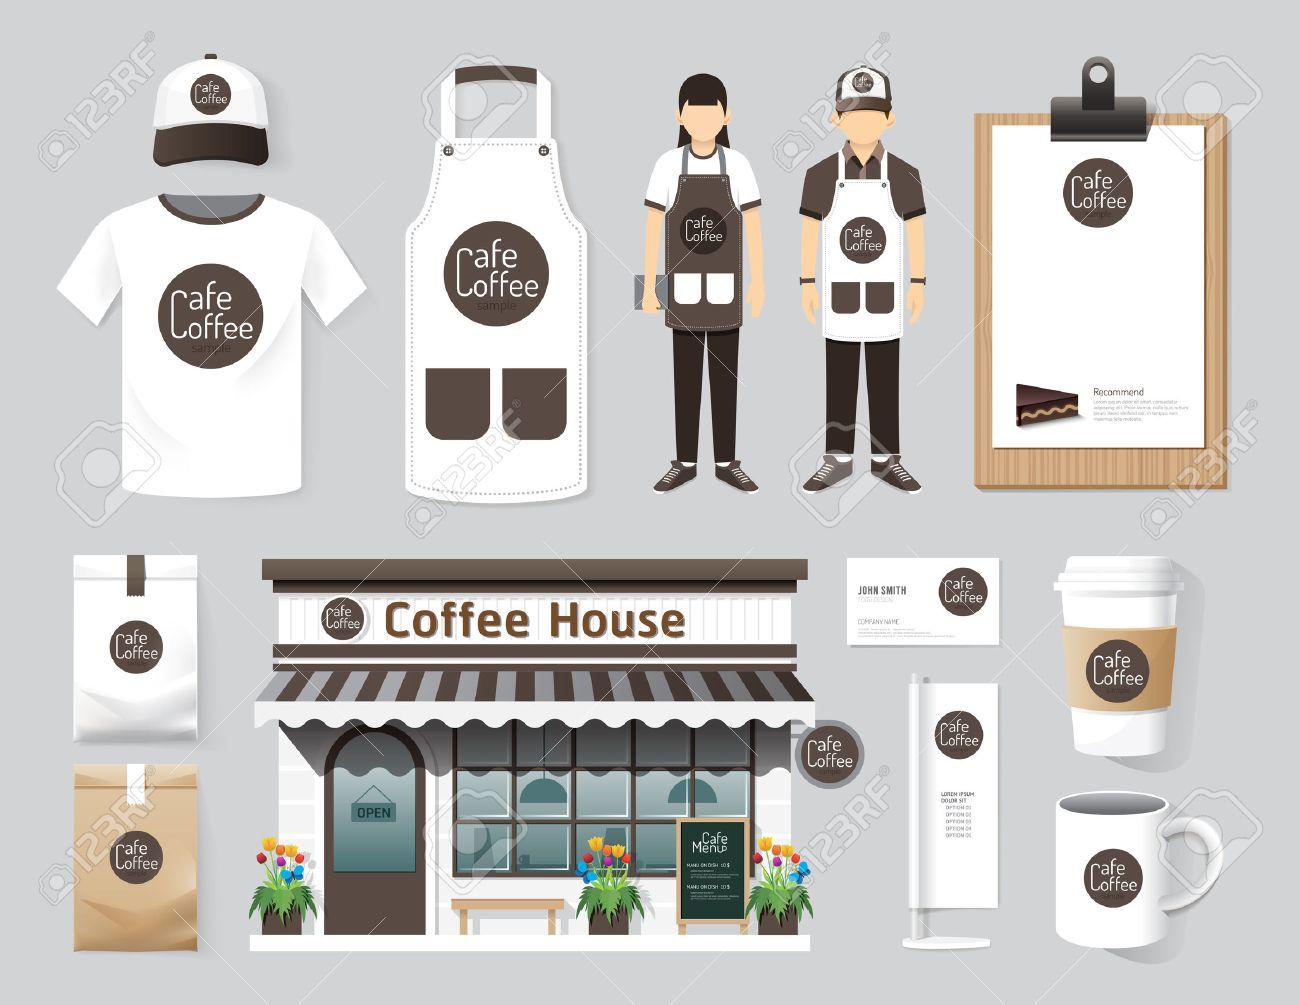 White apron mockup free - Apron Template Vector Restaurant Cafe Set Shop Front Design Flyer Menu Package